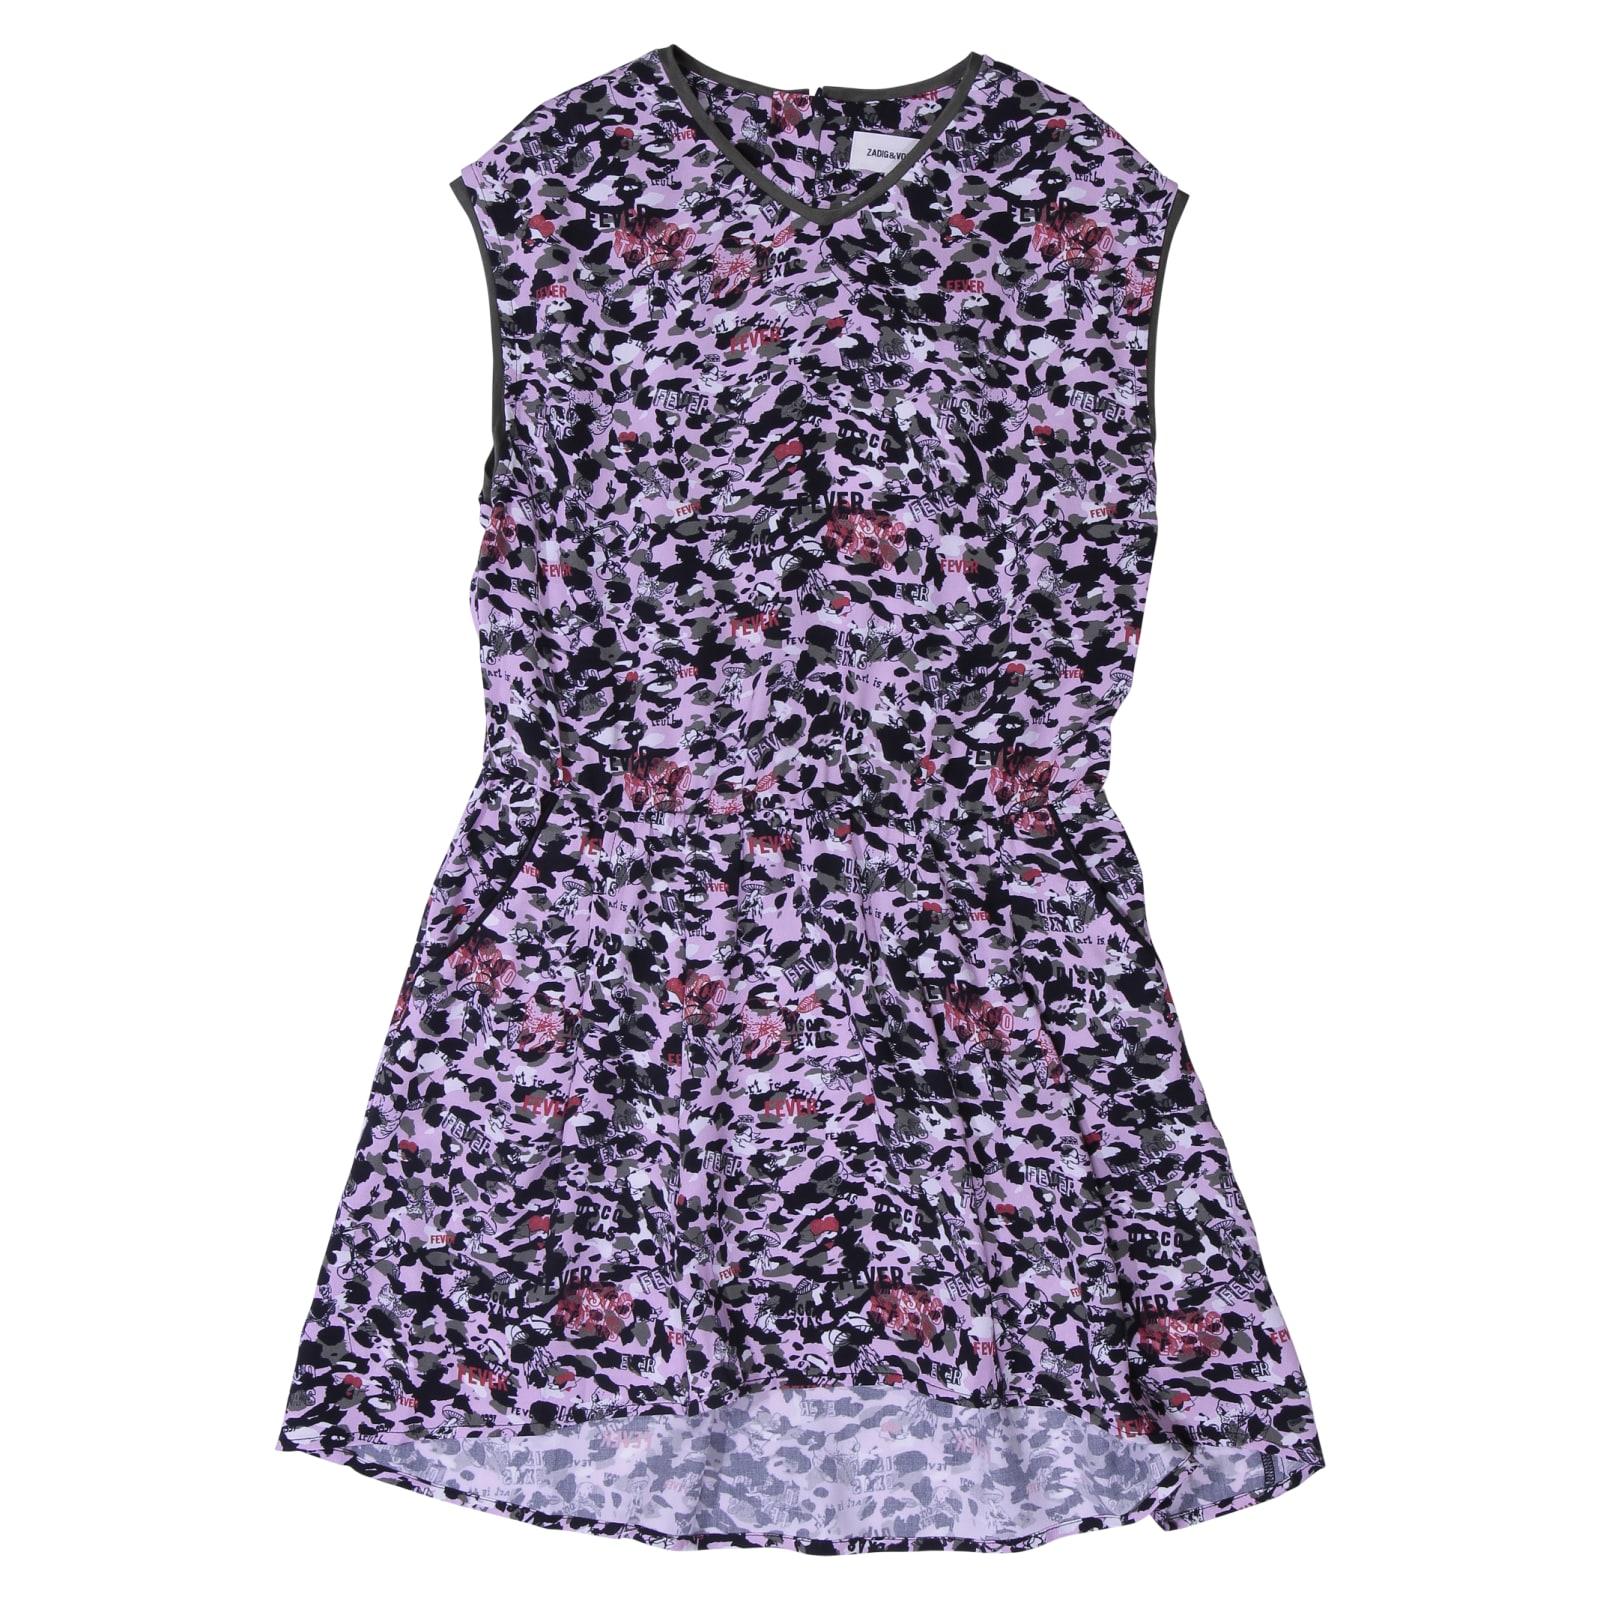 Zadig & Voltaire Printed Pink Viscose Dress